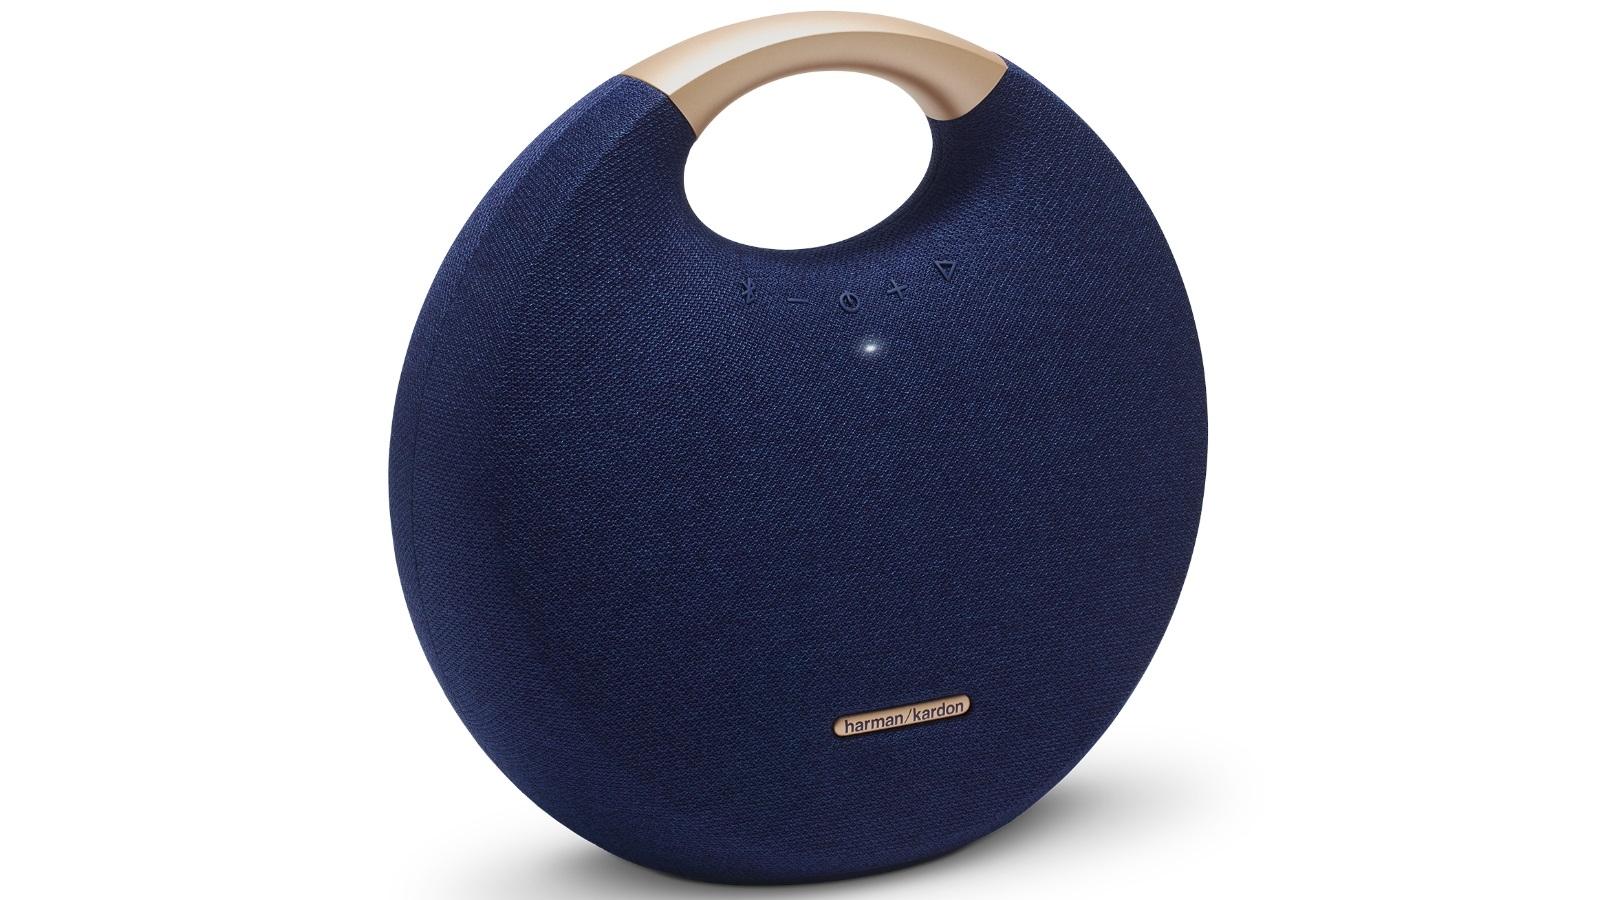 Harman Kardon Onyx Studio 5 Portable Bluetooth Speaker - Blue